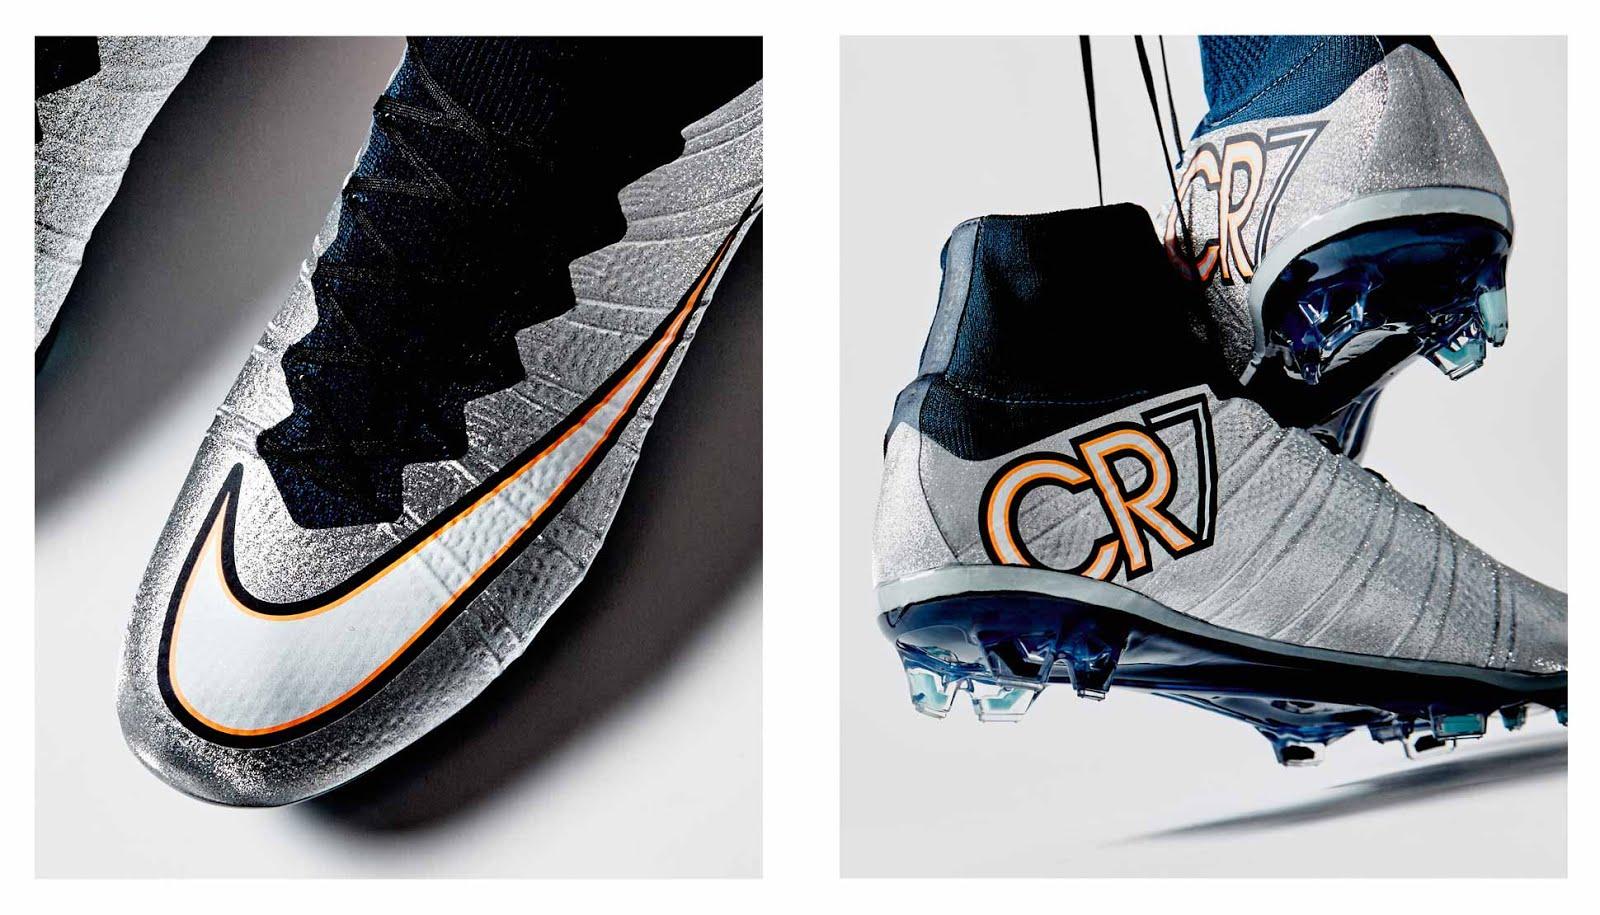 Botas de futbol   Nike Mercurial Superfly CR7 Silverware 2015 296c58bca8e8c